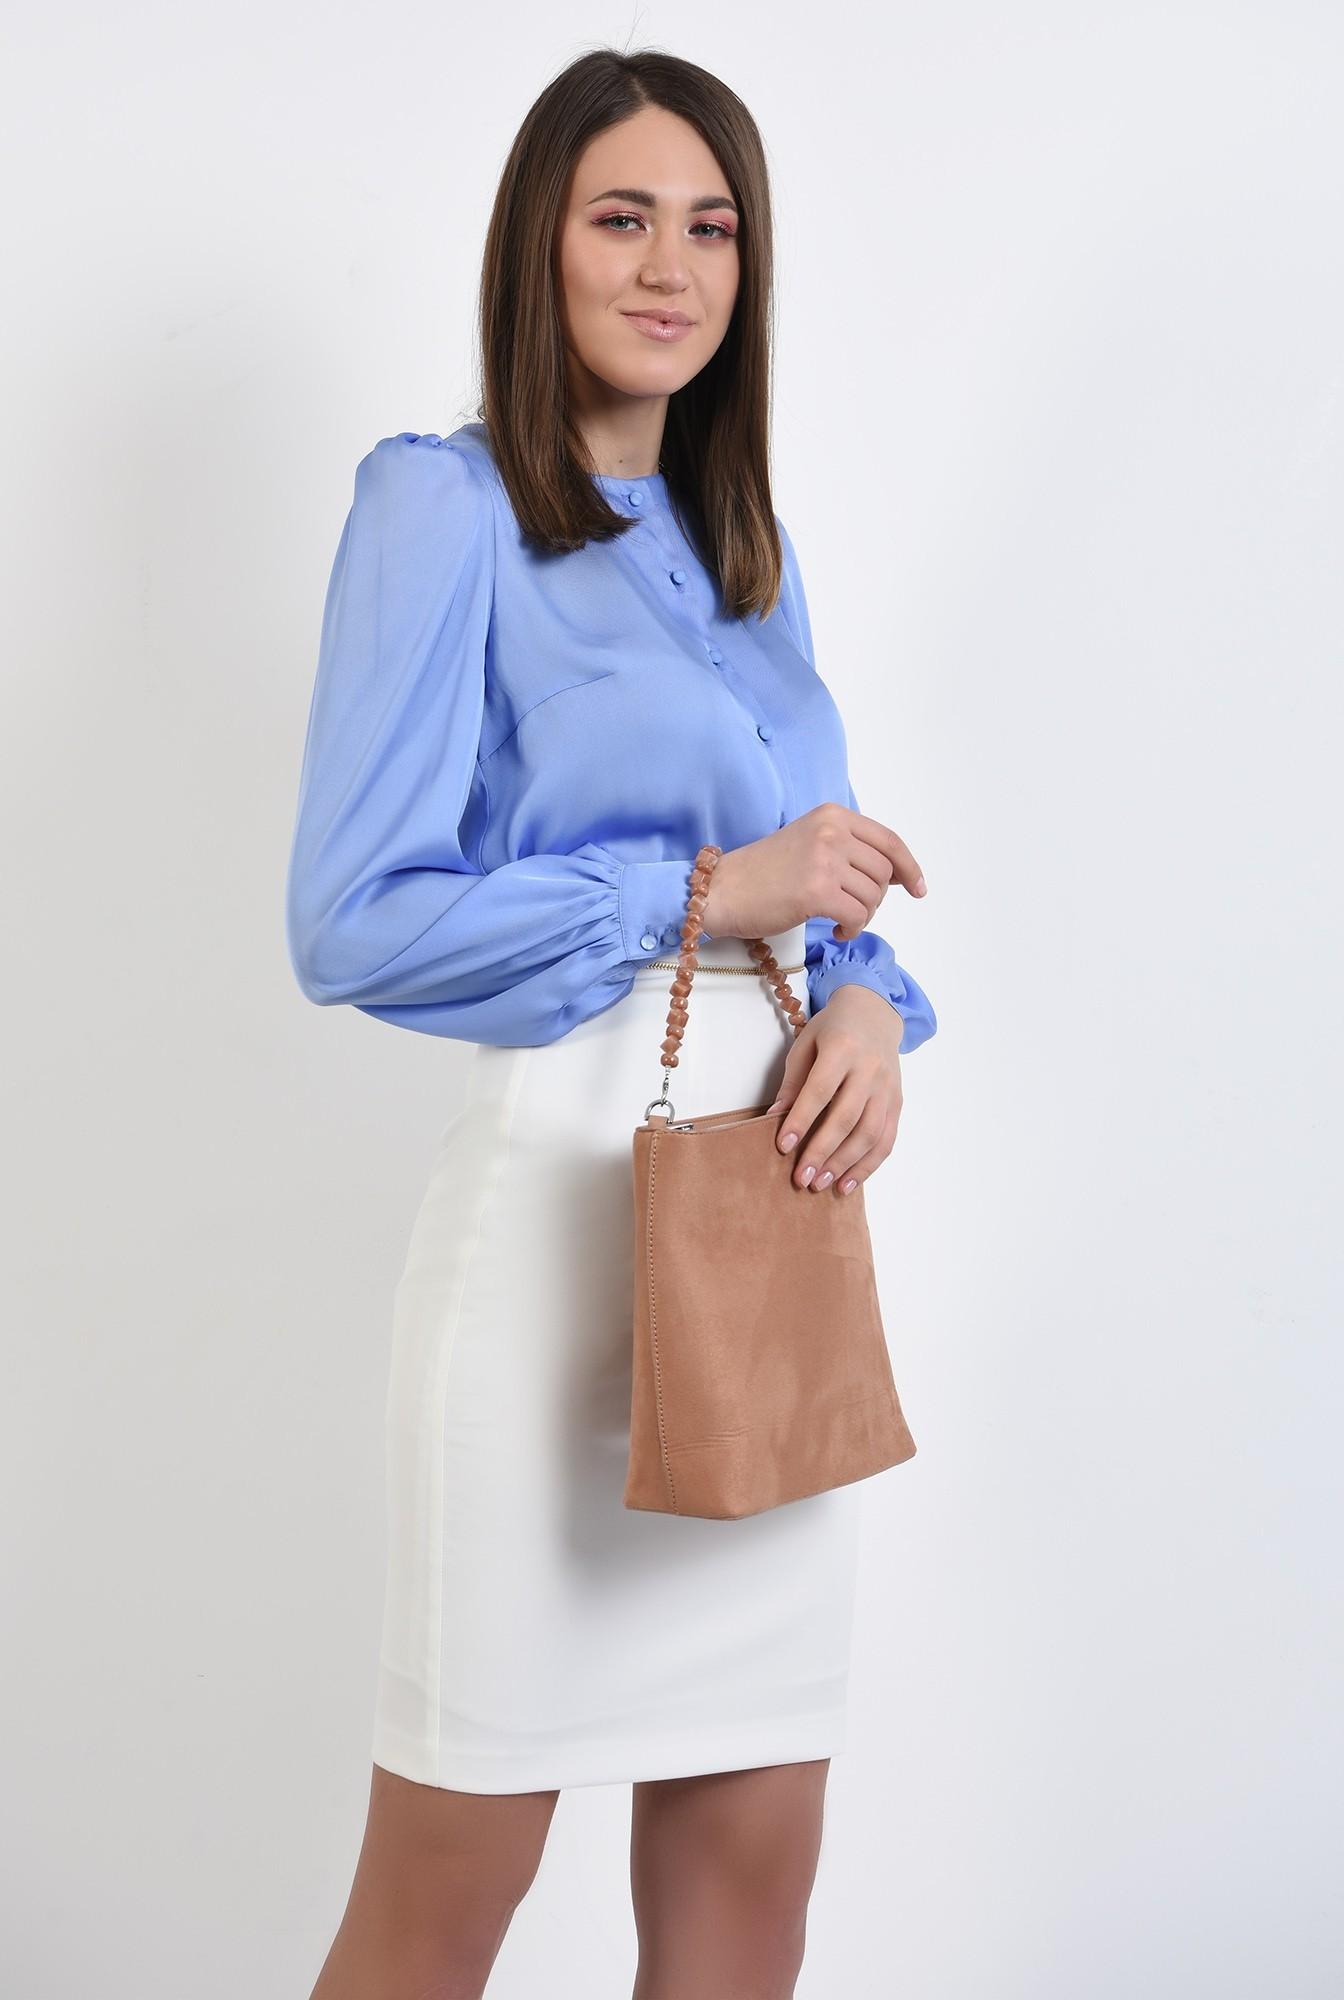 0 - bluza de primavara, office, cu nasturi, maneci lungi